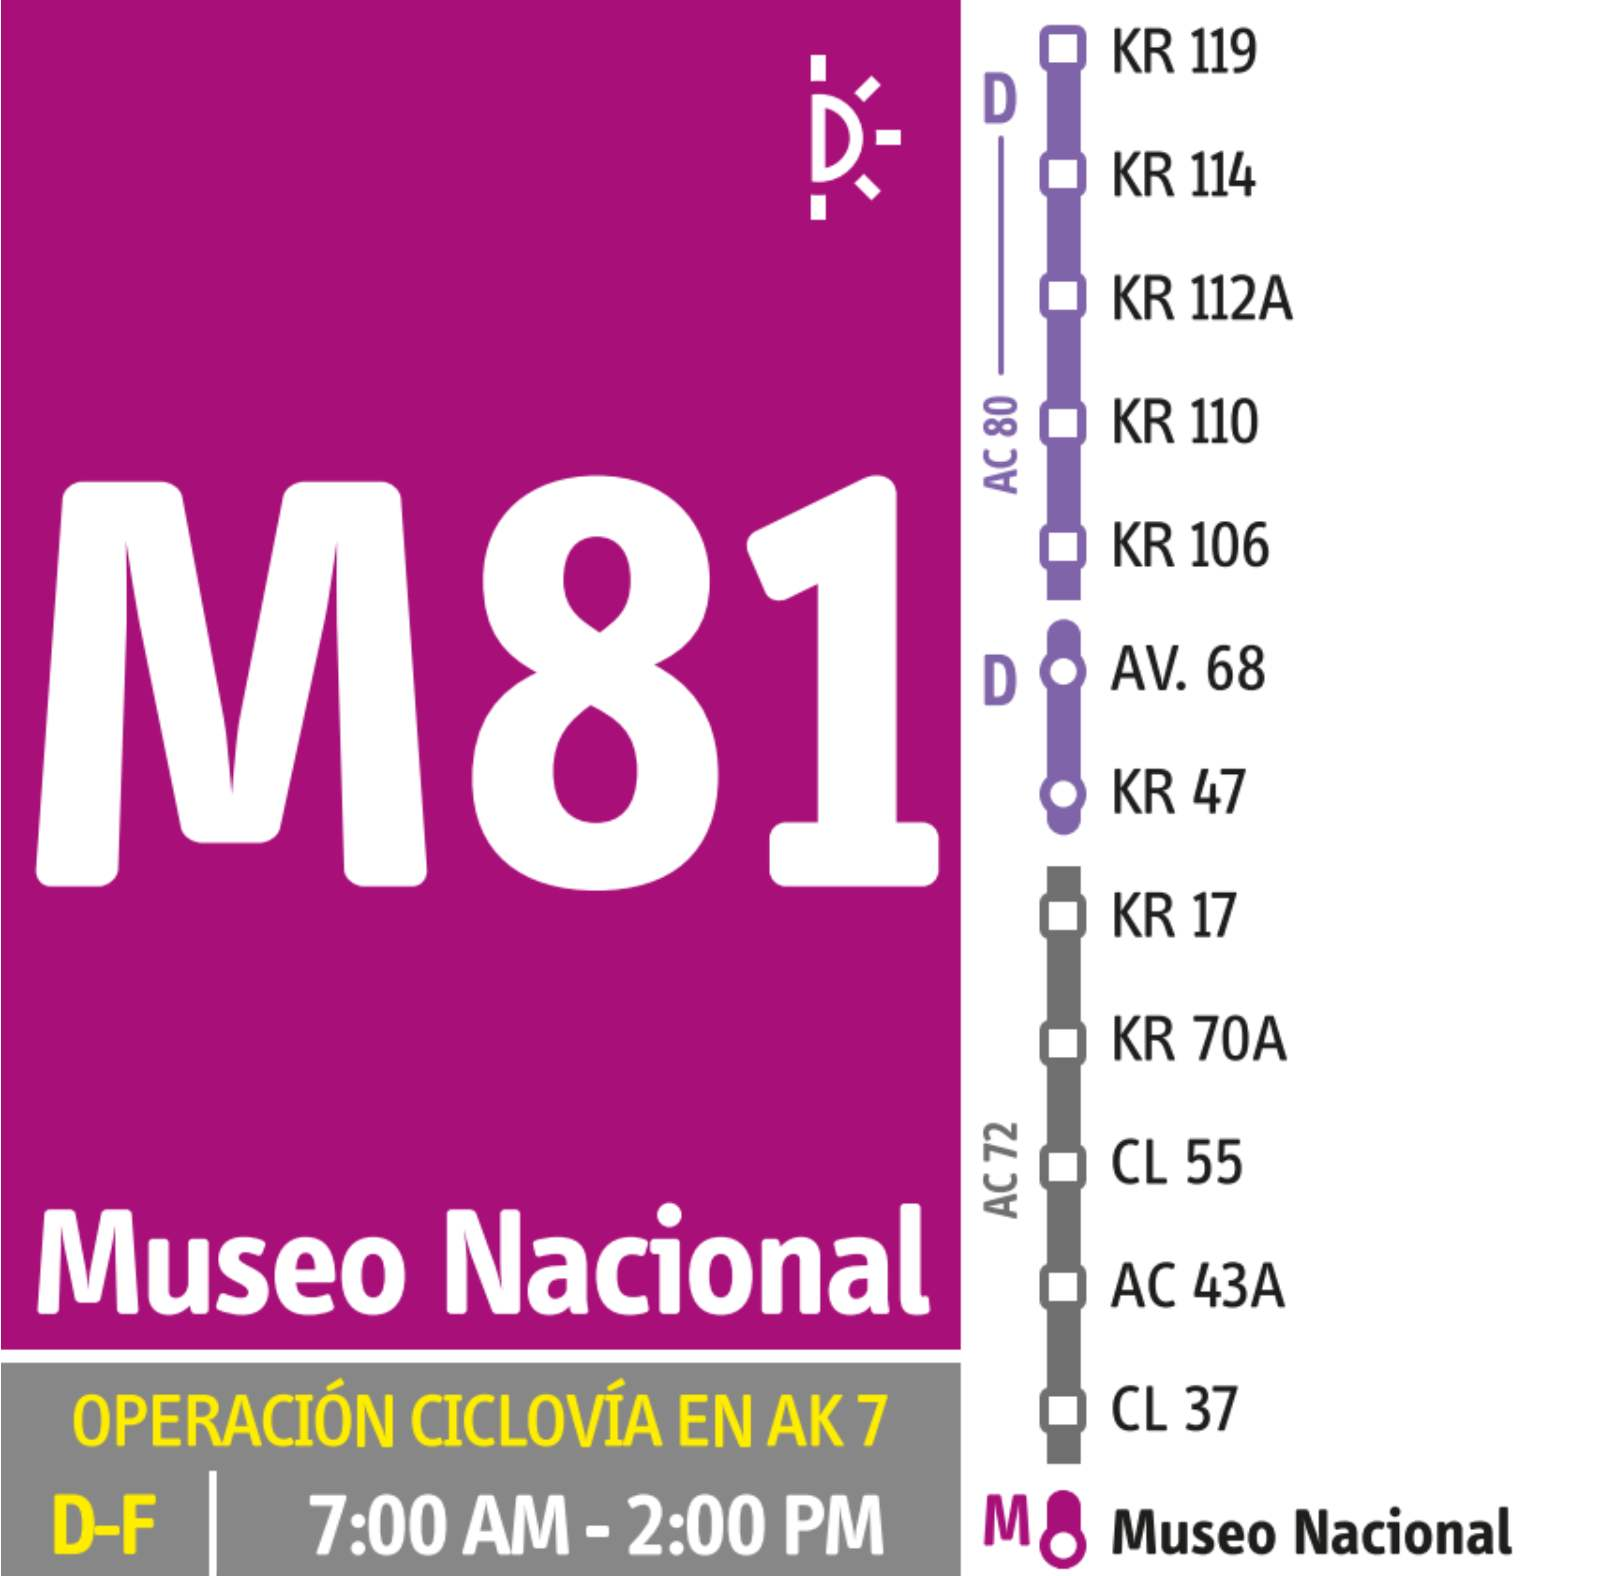 M81-D81 > Calle 80 Puente de Guadua- Museo Nacional (festivos)